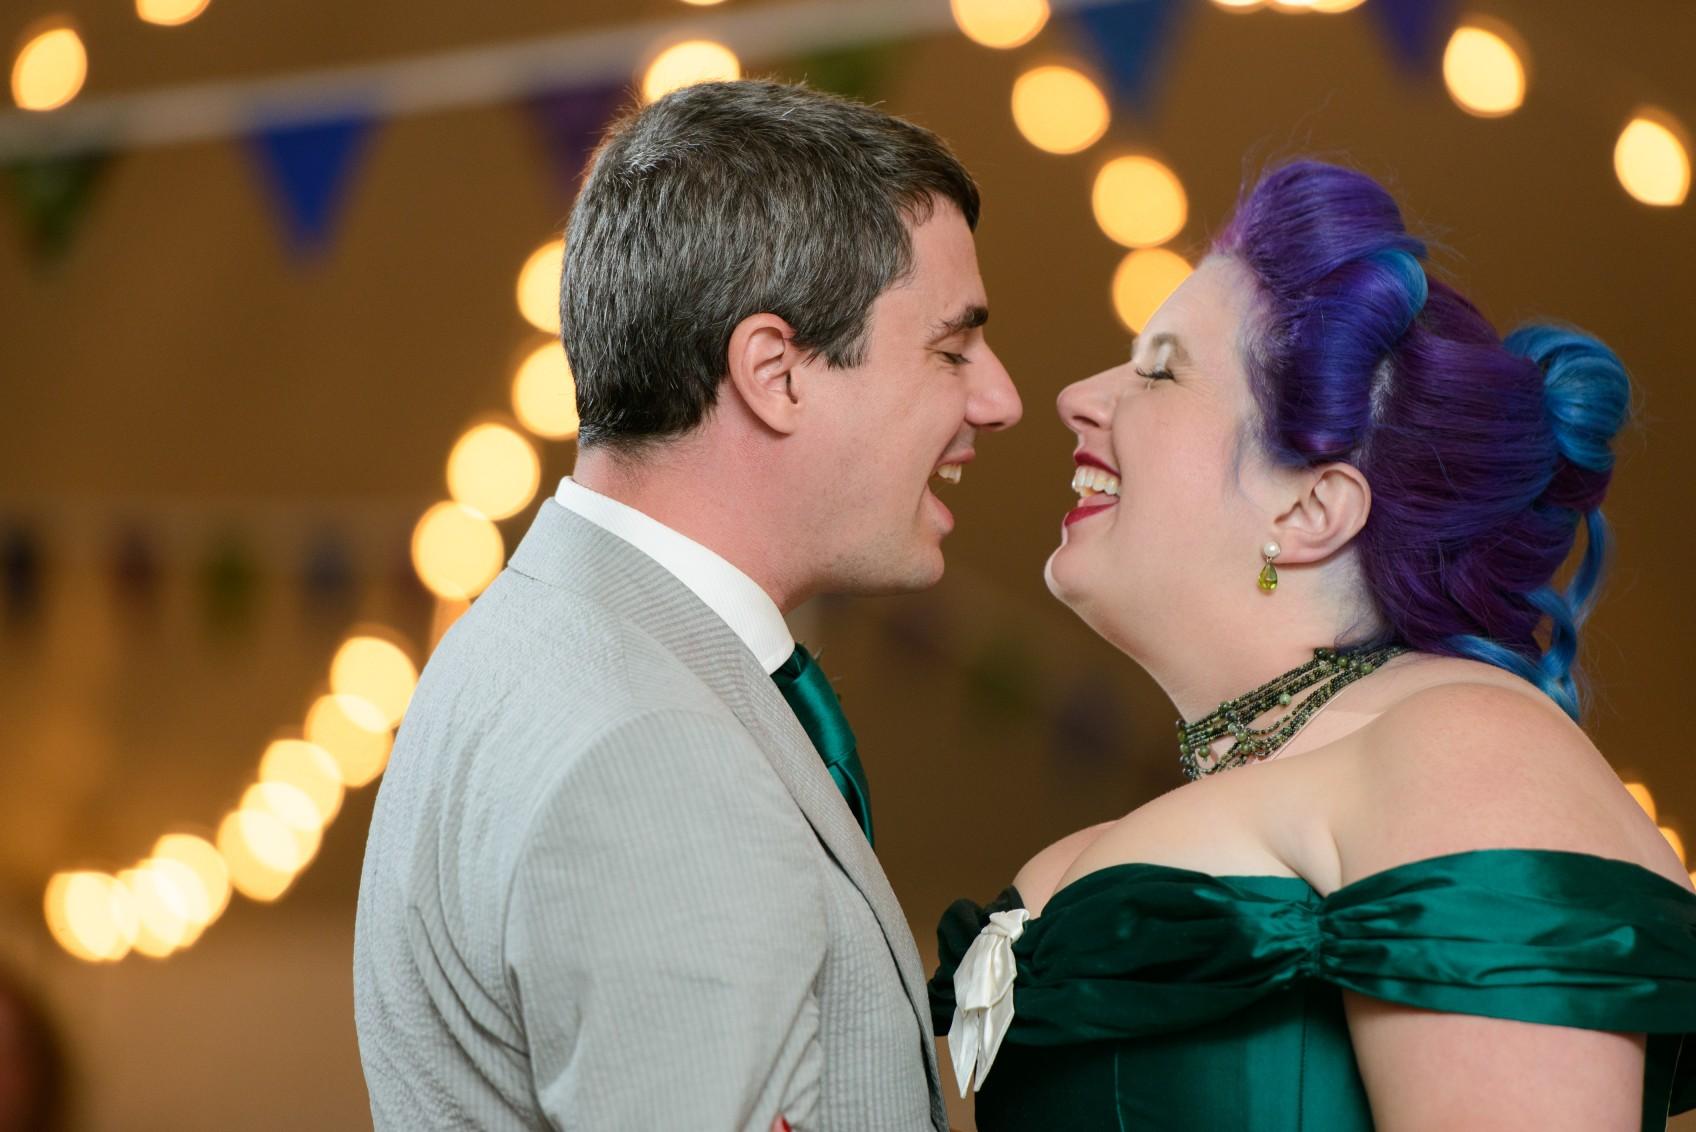 happy wedding photo - fun wedding day - alternative wedding - unconventional wedding